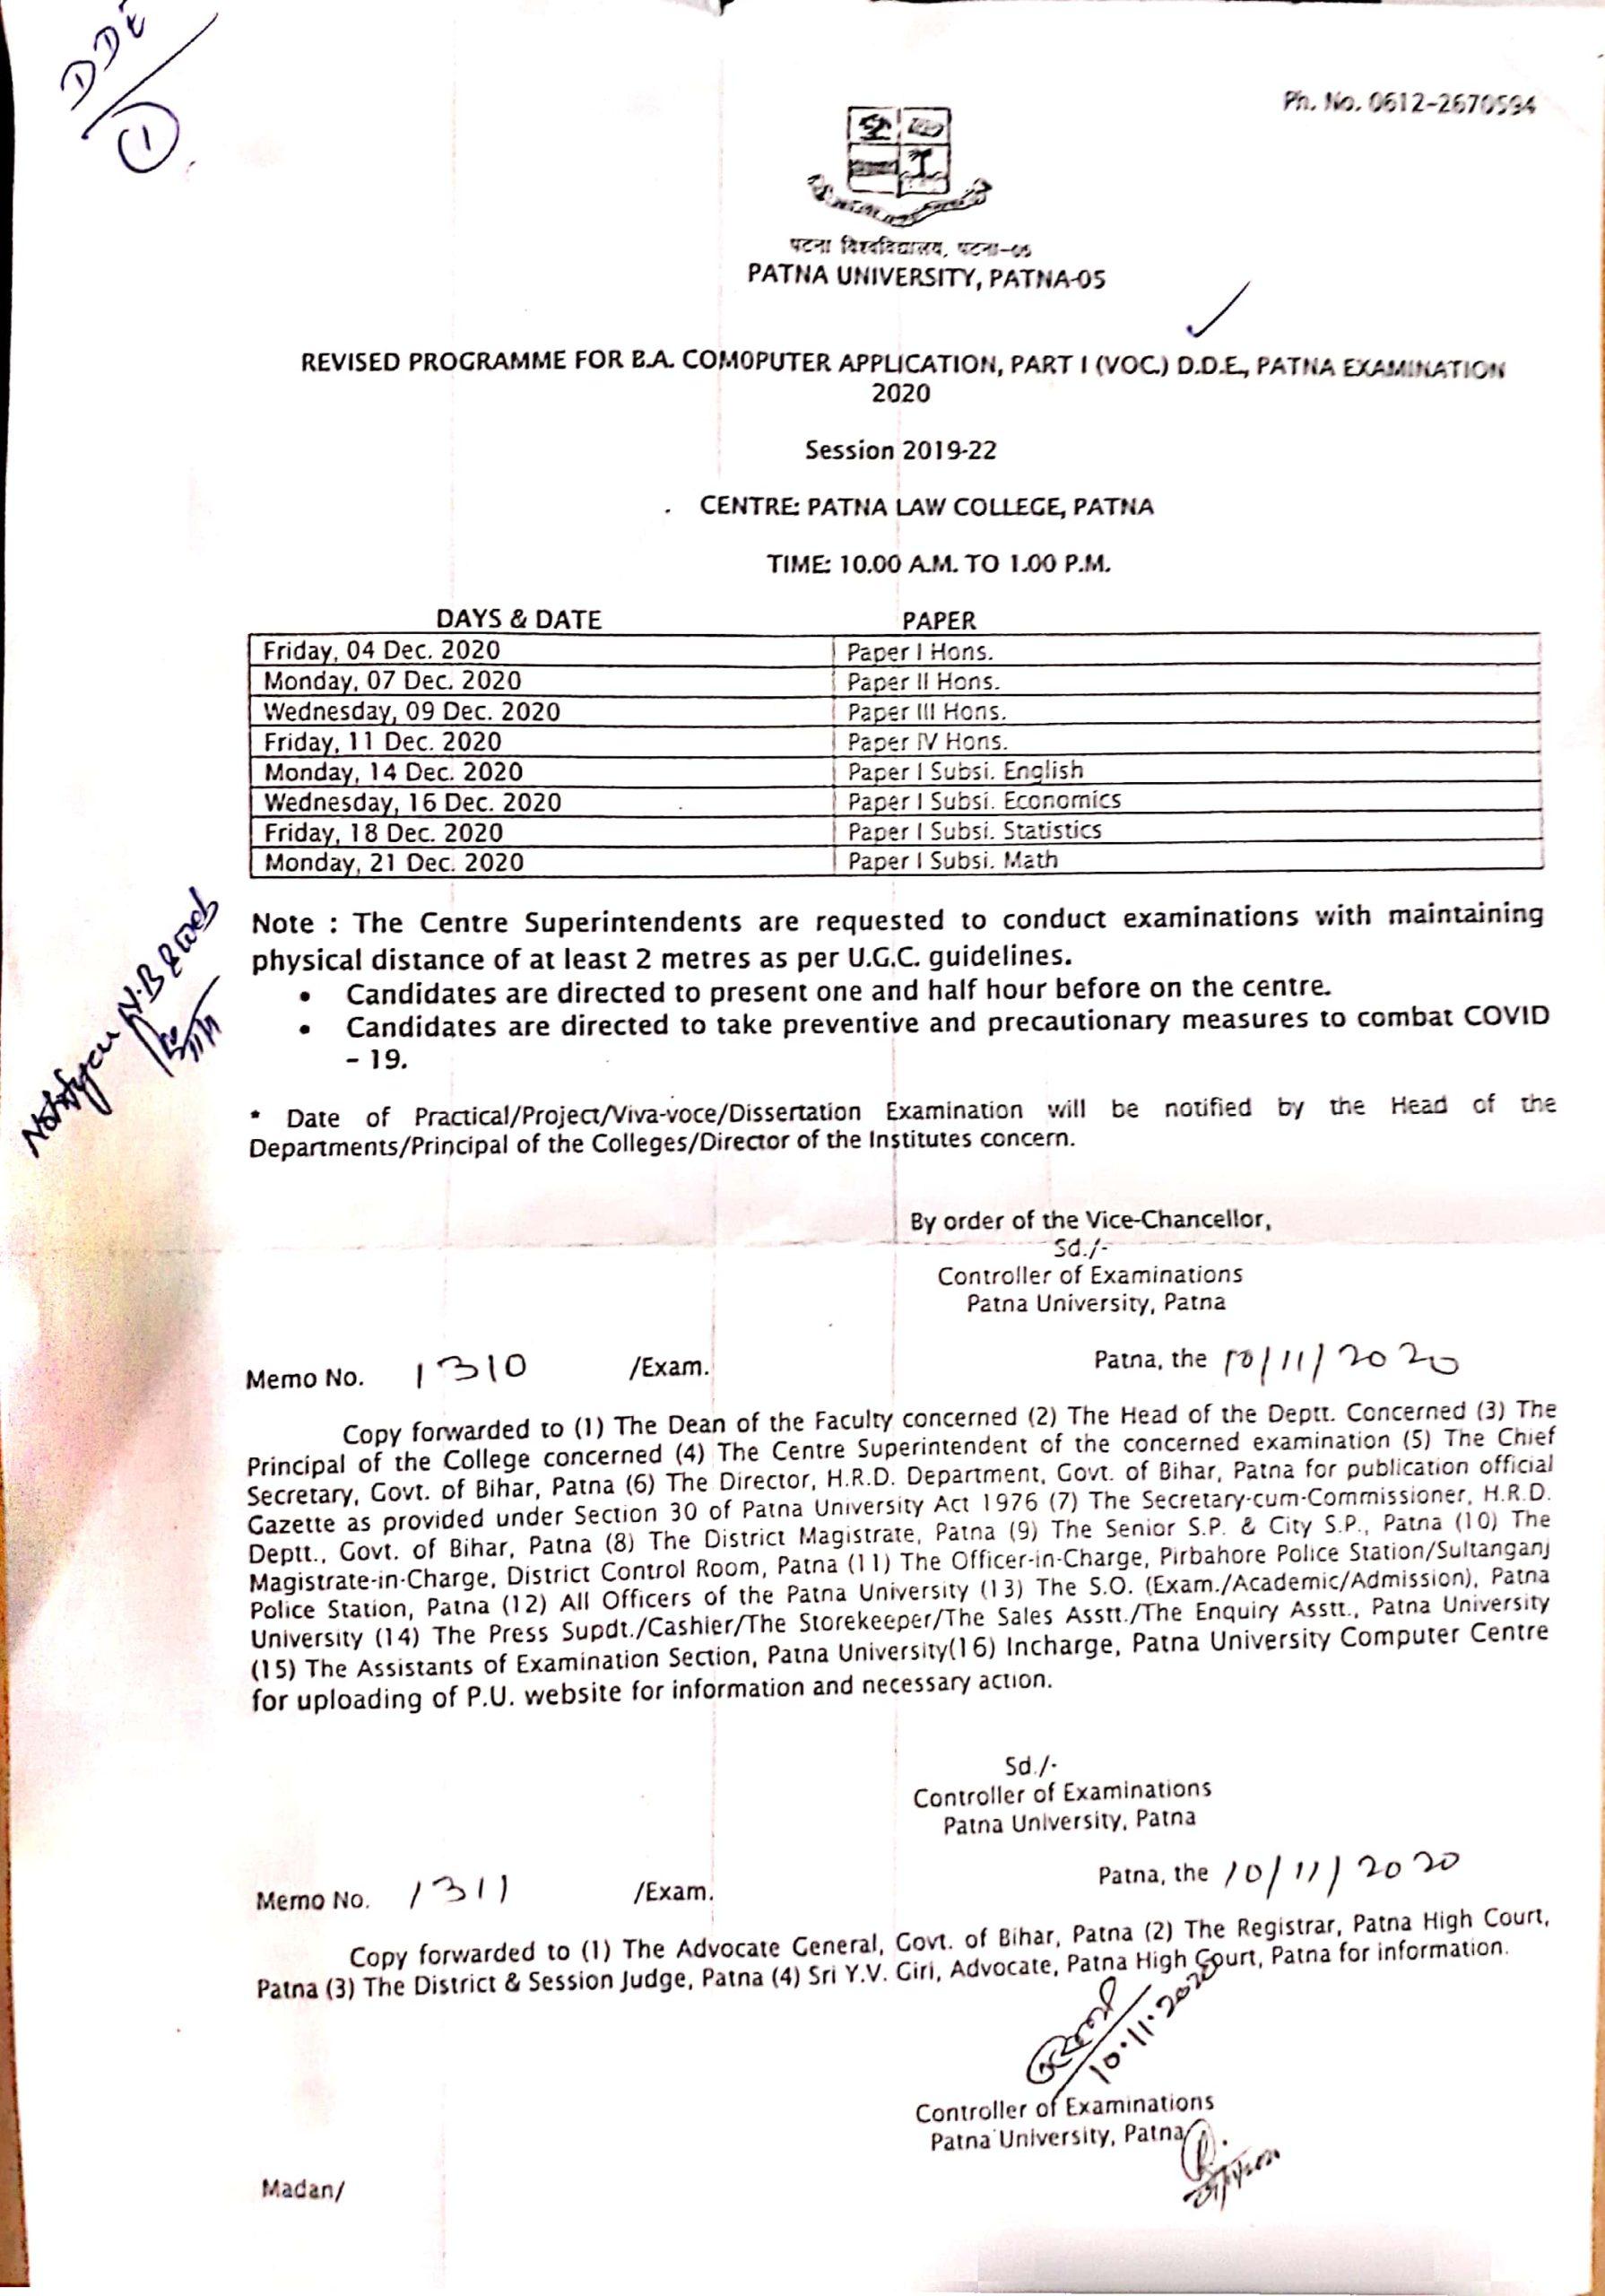 Revised Programme For B.A. Computer Application, Part I (VOC) D.D.E., Patna Examination 2020 Session 2019-20